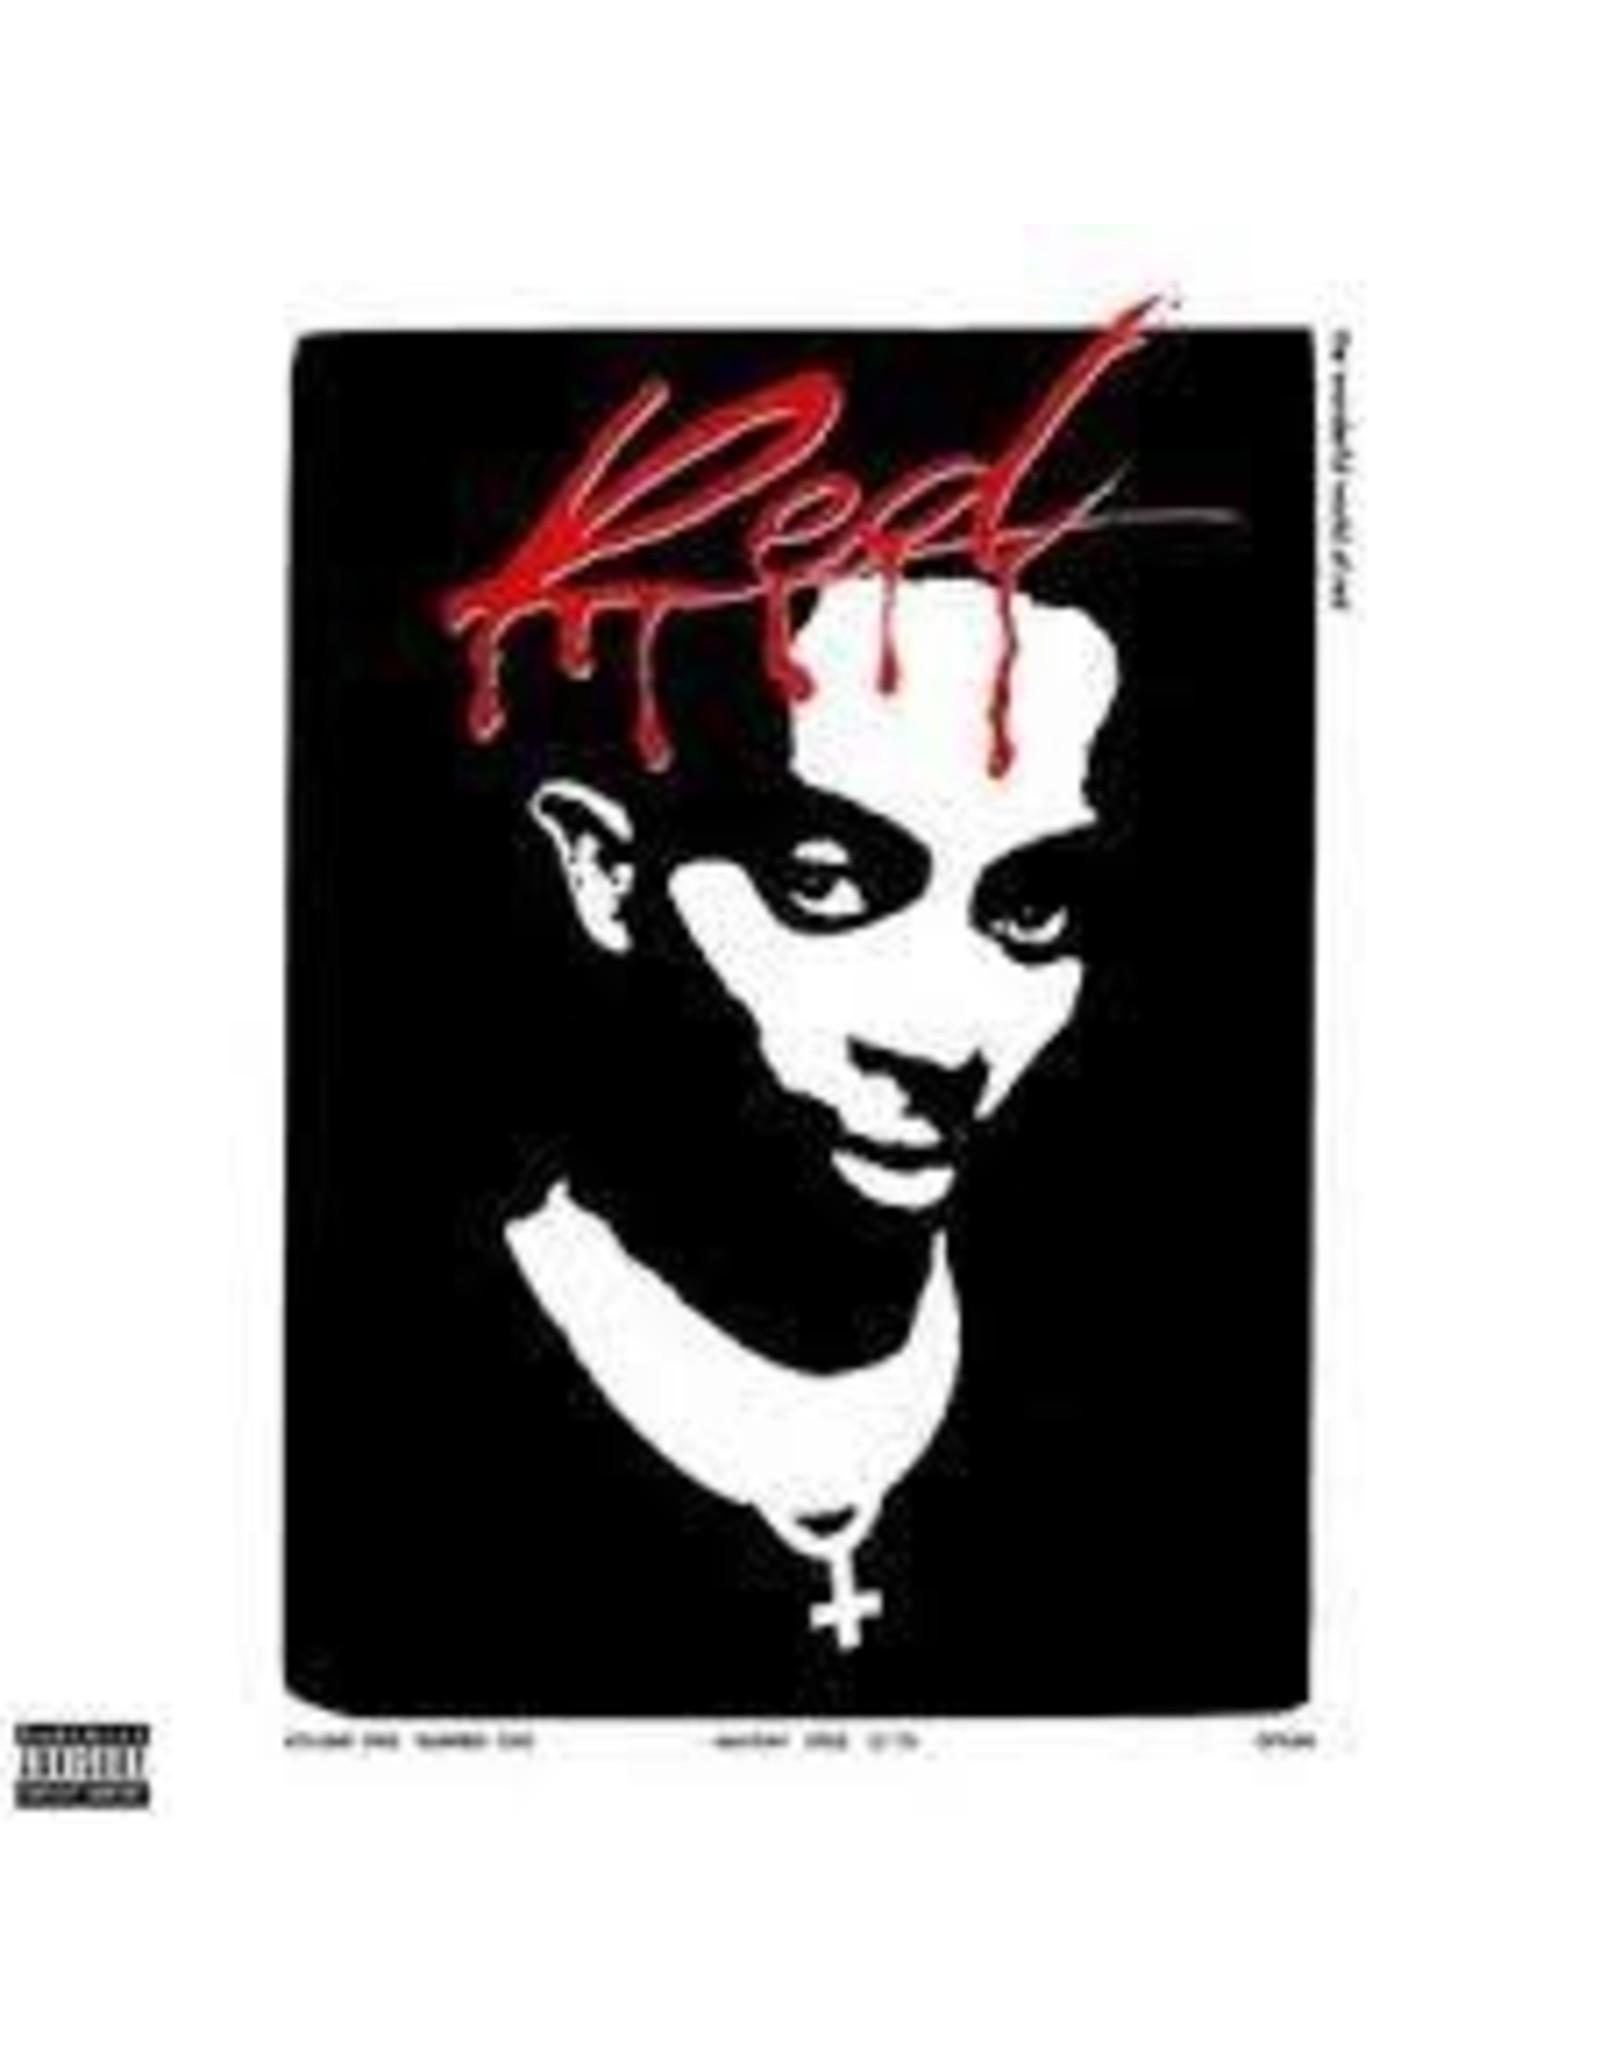 Playboi Carti - Whole Lotta Red LP